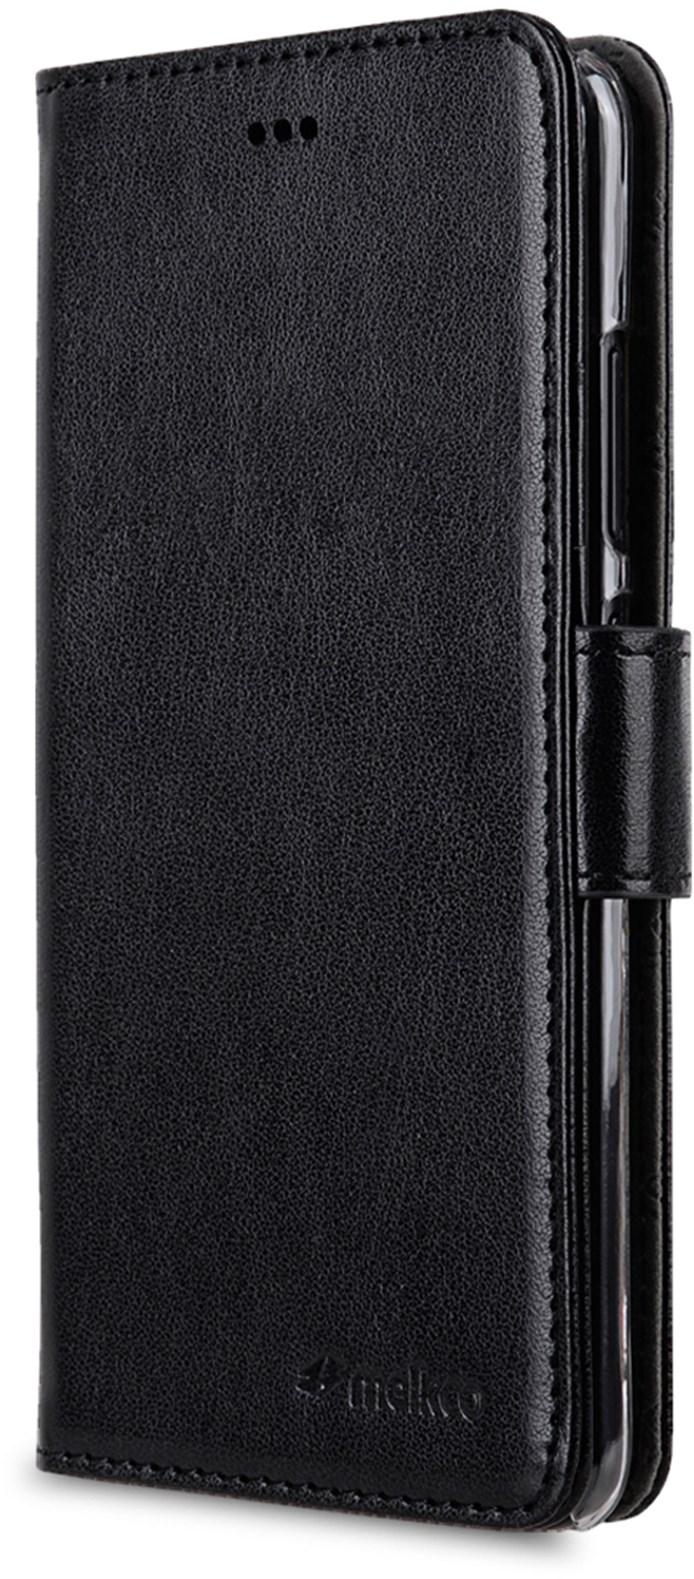 Melkco Walletcase Huawei P20 Lite Black